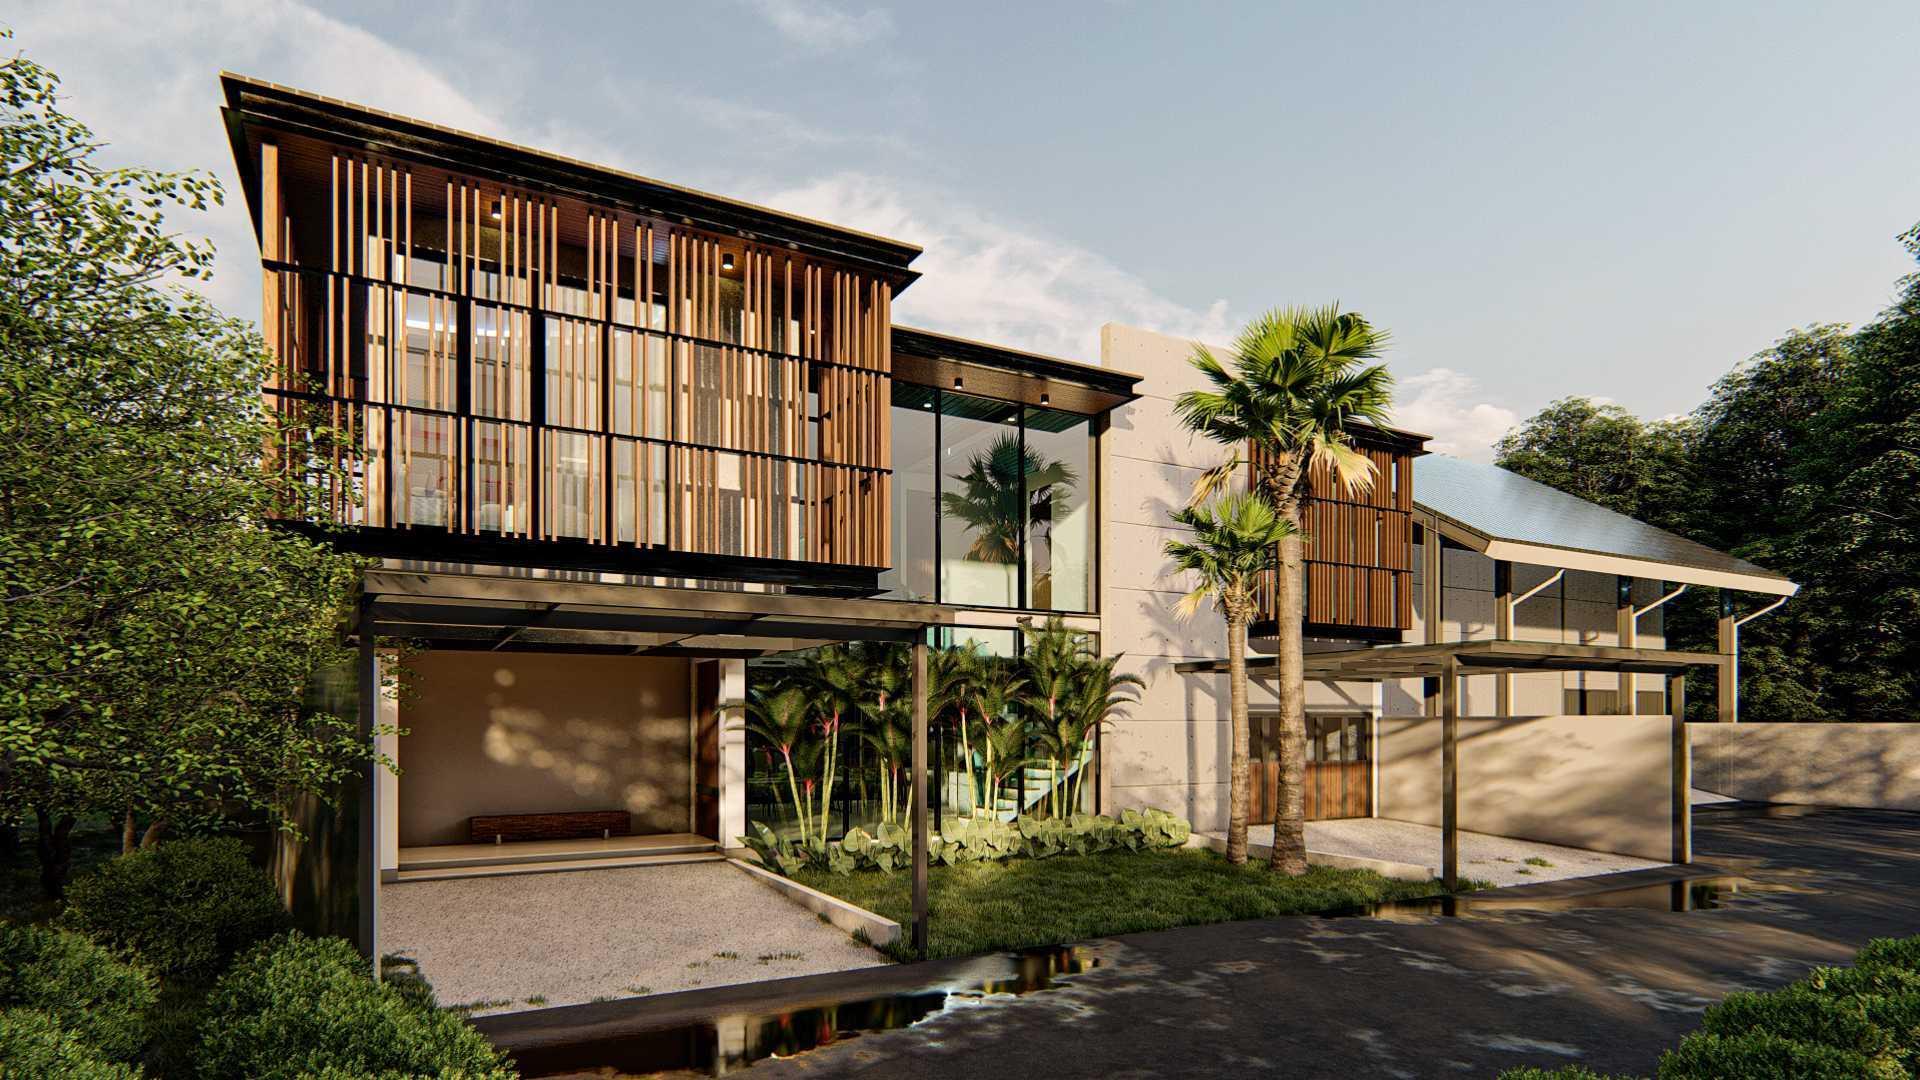 Ruang Rupa Studio Sr House Soreang, Kec. Soreang, Bandung, Jawa Barat, Indonesia Soreang, Kec. Soreang, Bandung, Jawa Barat, Indonesia Sr House Facade #2 Modern  113789